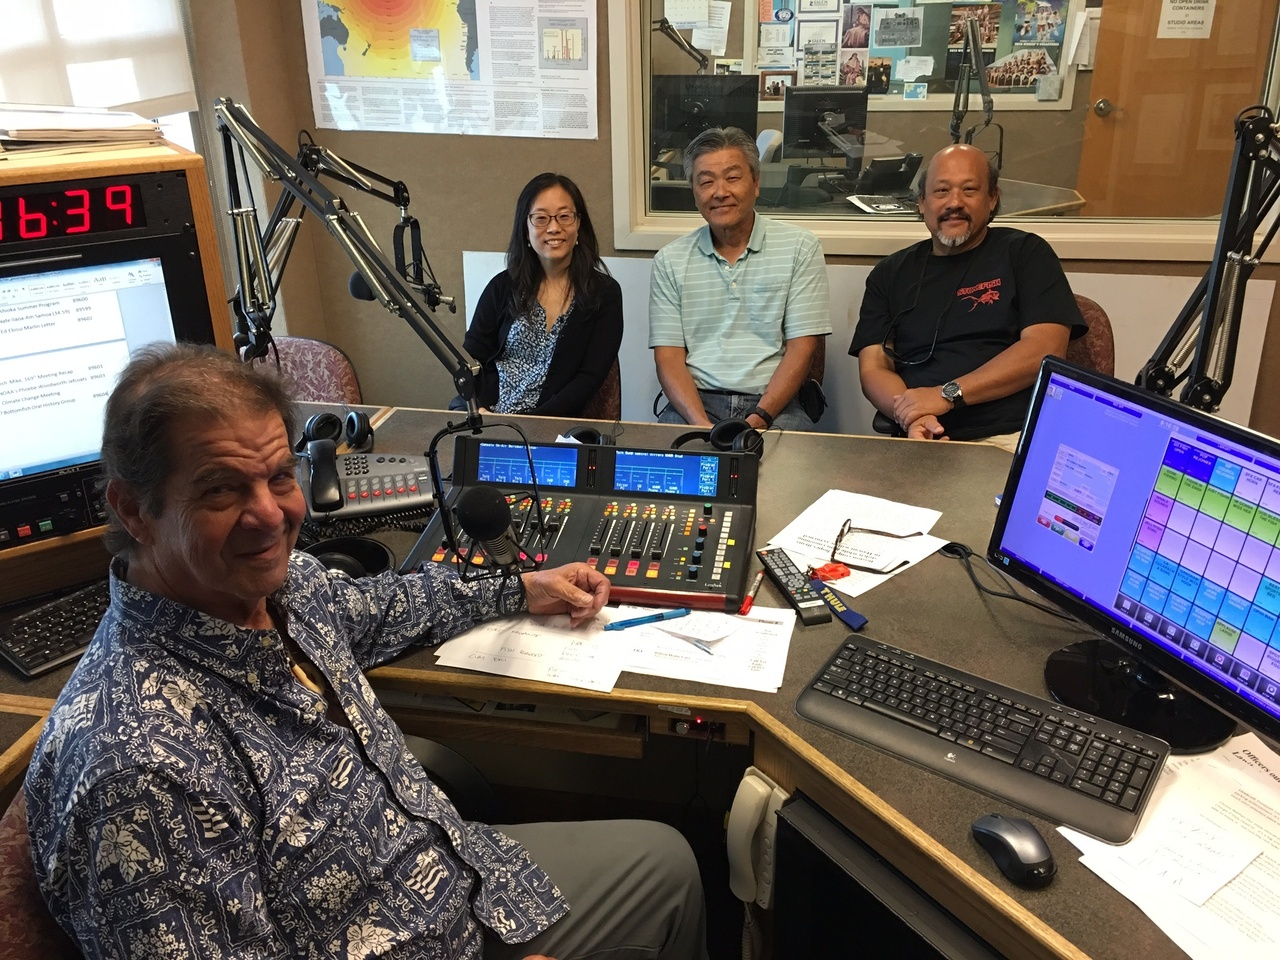 Kirsten Leong NOAA Social Scientist, Kurt Kawamoto NOAA Fishery Biologist, and Clay Tam Pacific Islands Fisheries Group in the studio with Mike Buck.